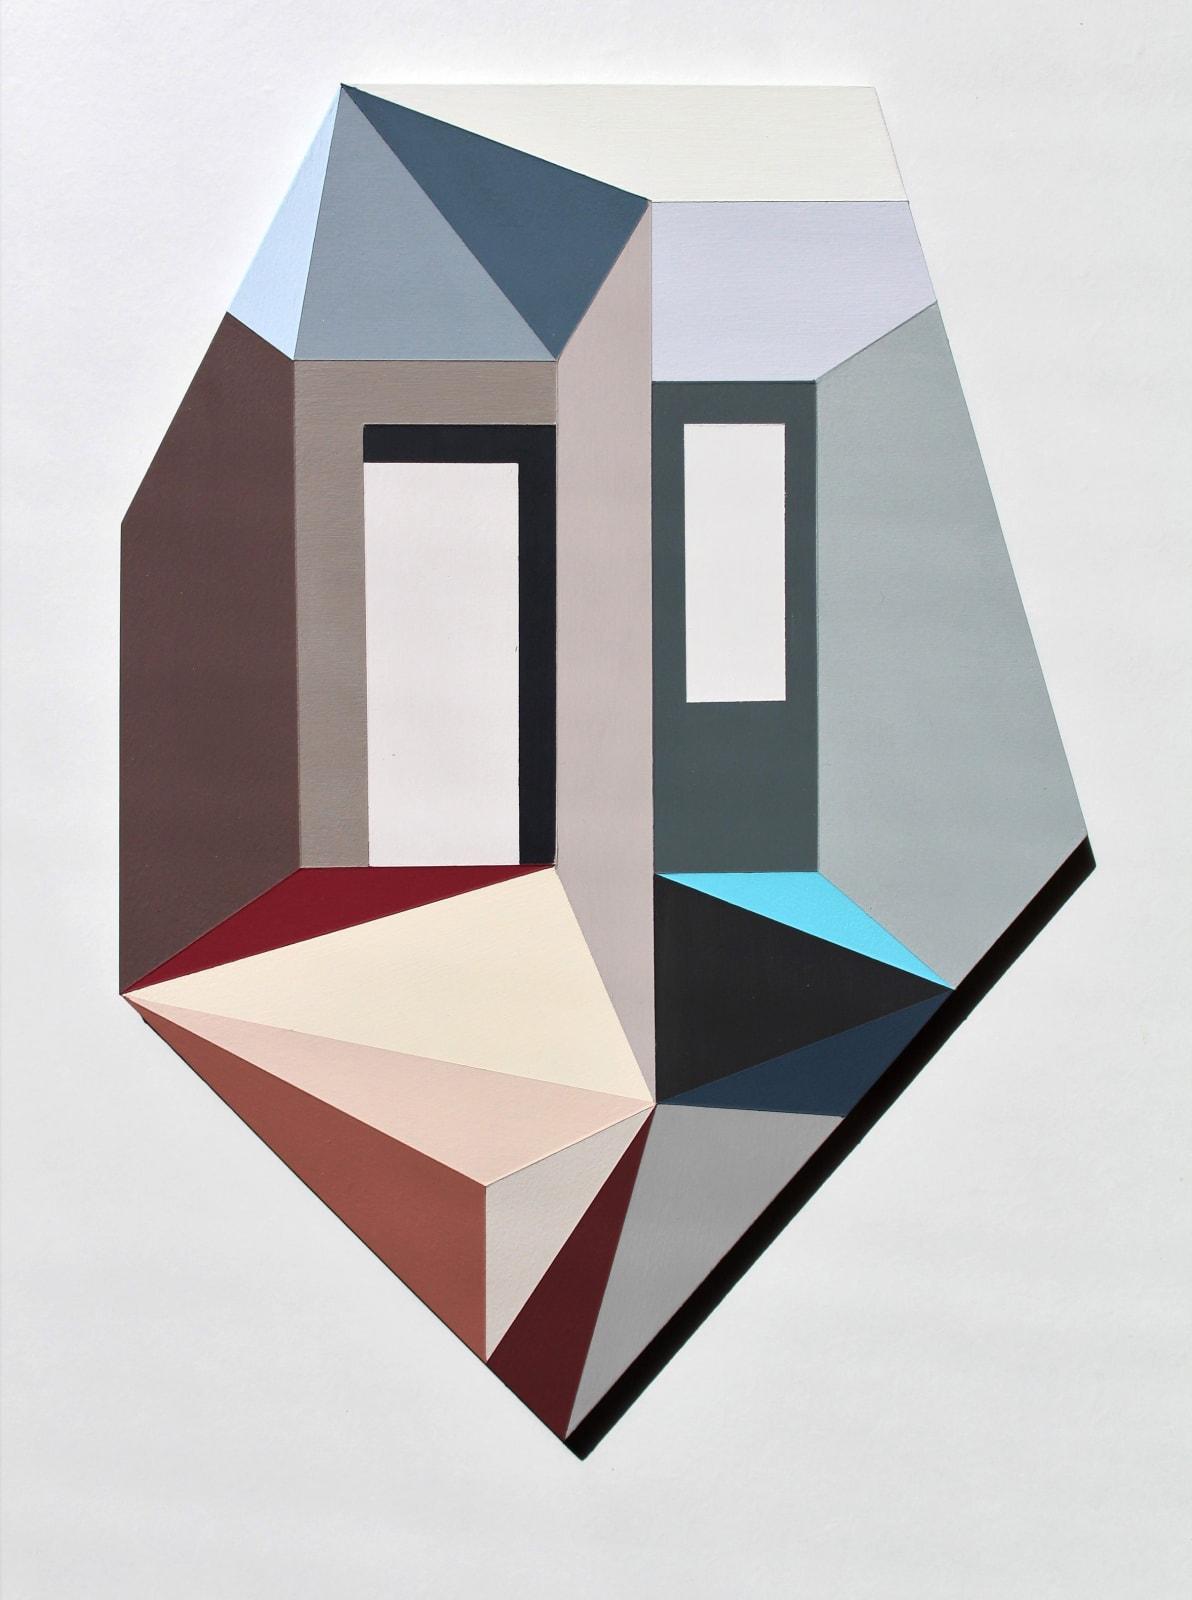 Megan Burns, Altered space 0.18, emulsion on board, 43 x 30 cm